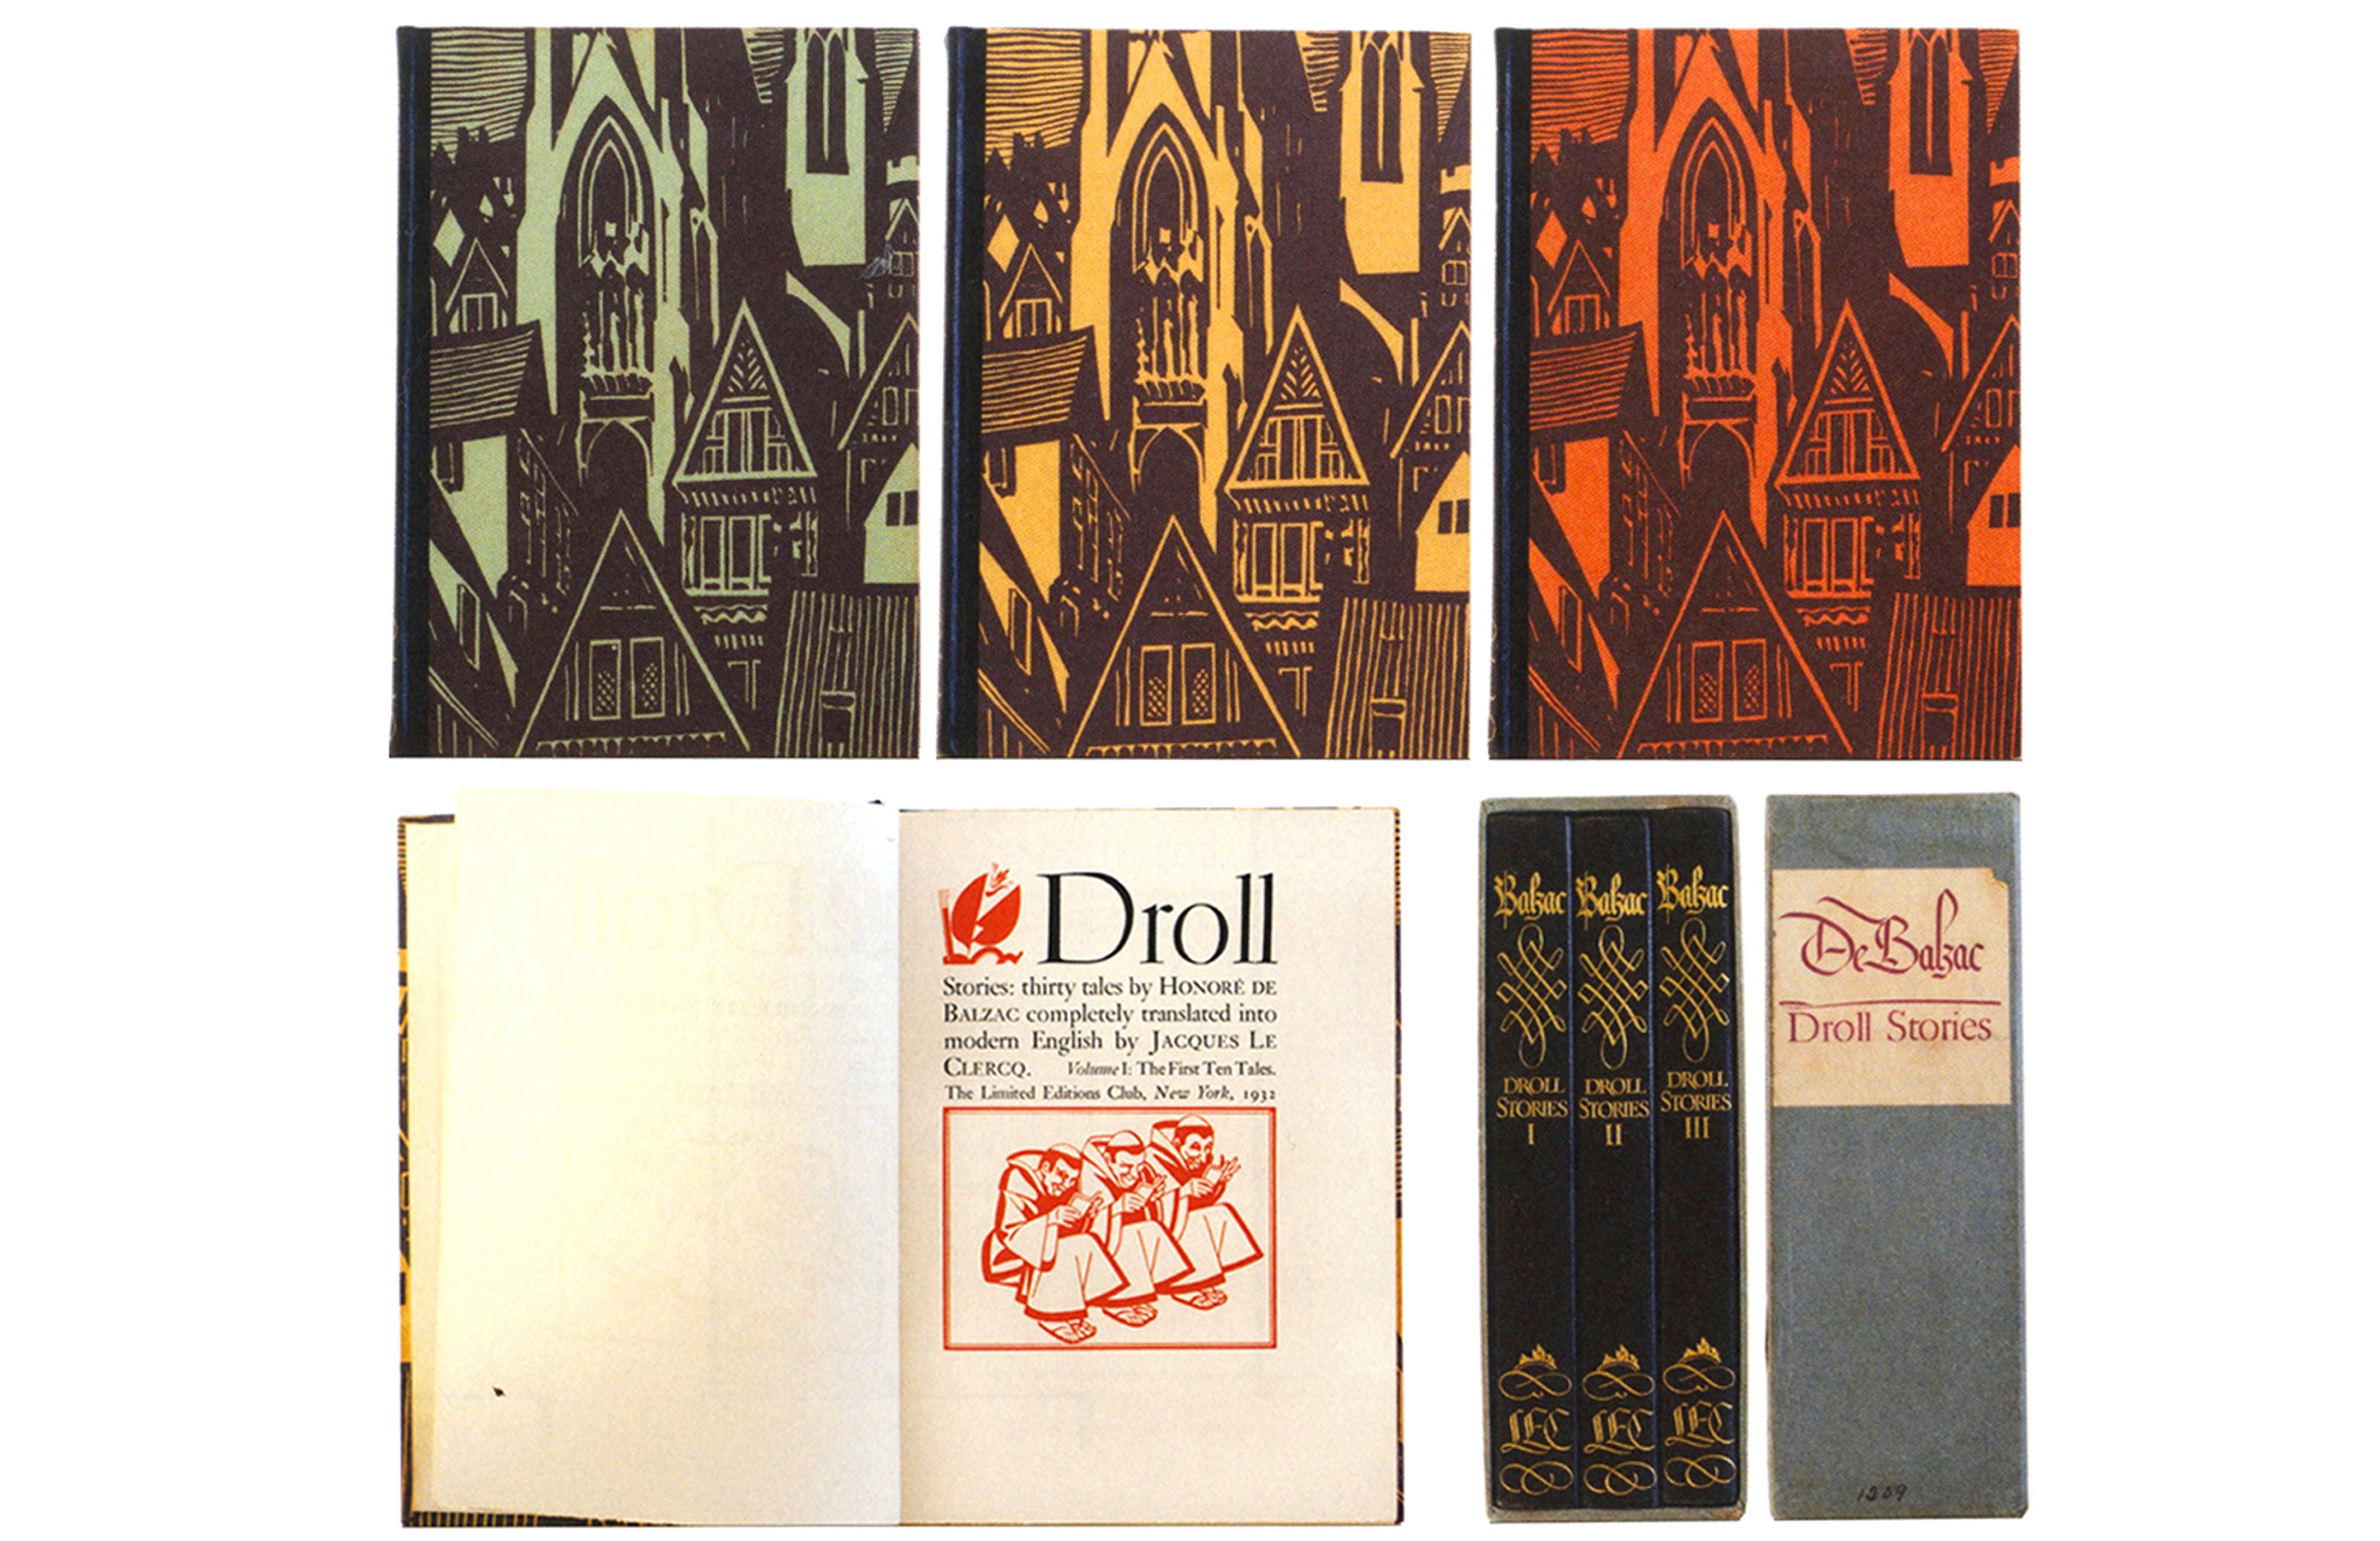 William-Addison-Dwiggins-DROLL-STORIES-Honore-de-BALZAC-1932